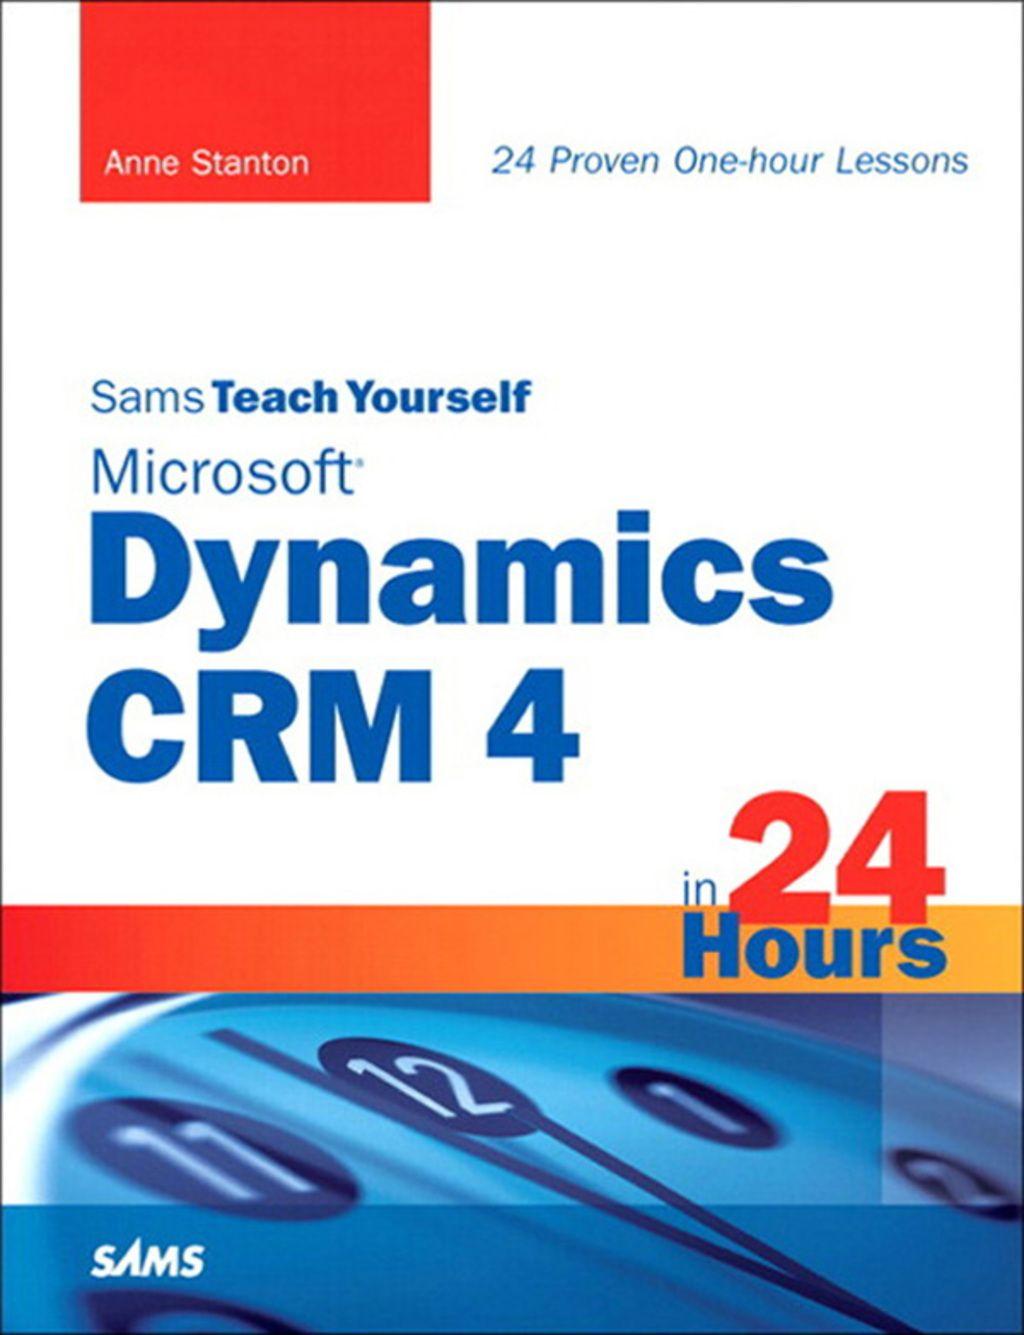 Sams Teach Yourself Microsoft Dynamics Crm 4 In 24 Hours Ebook